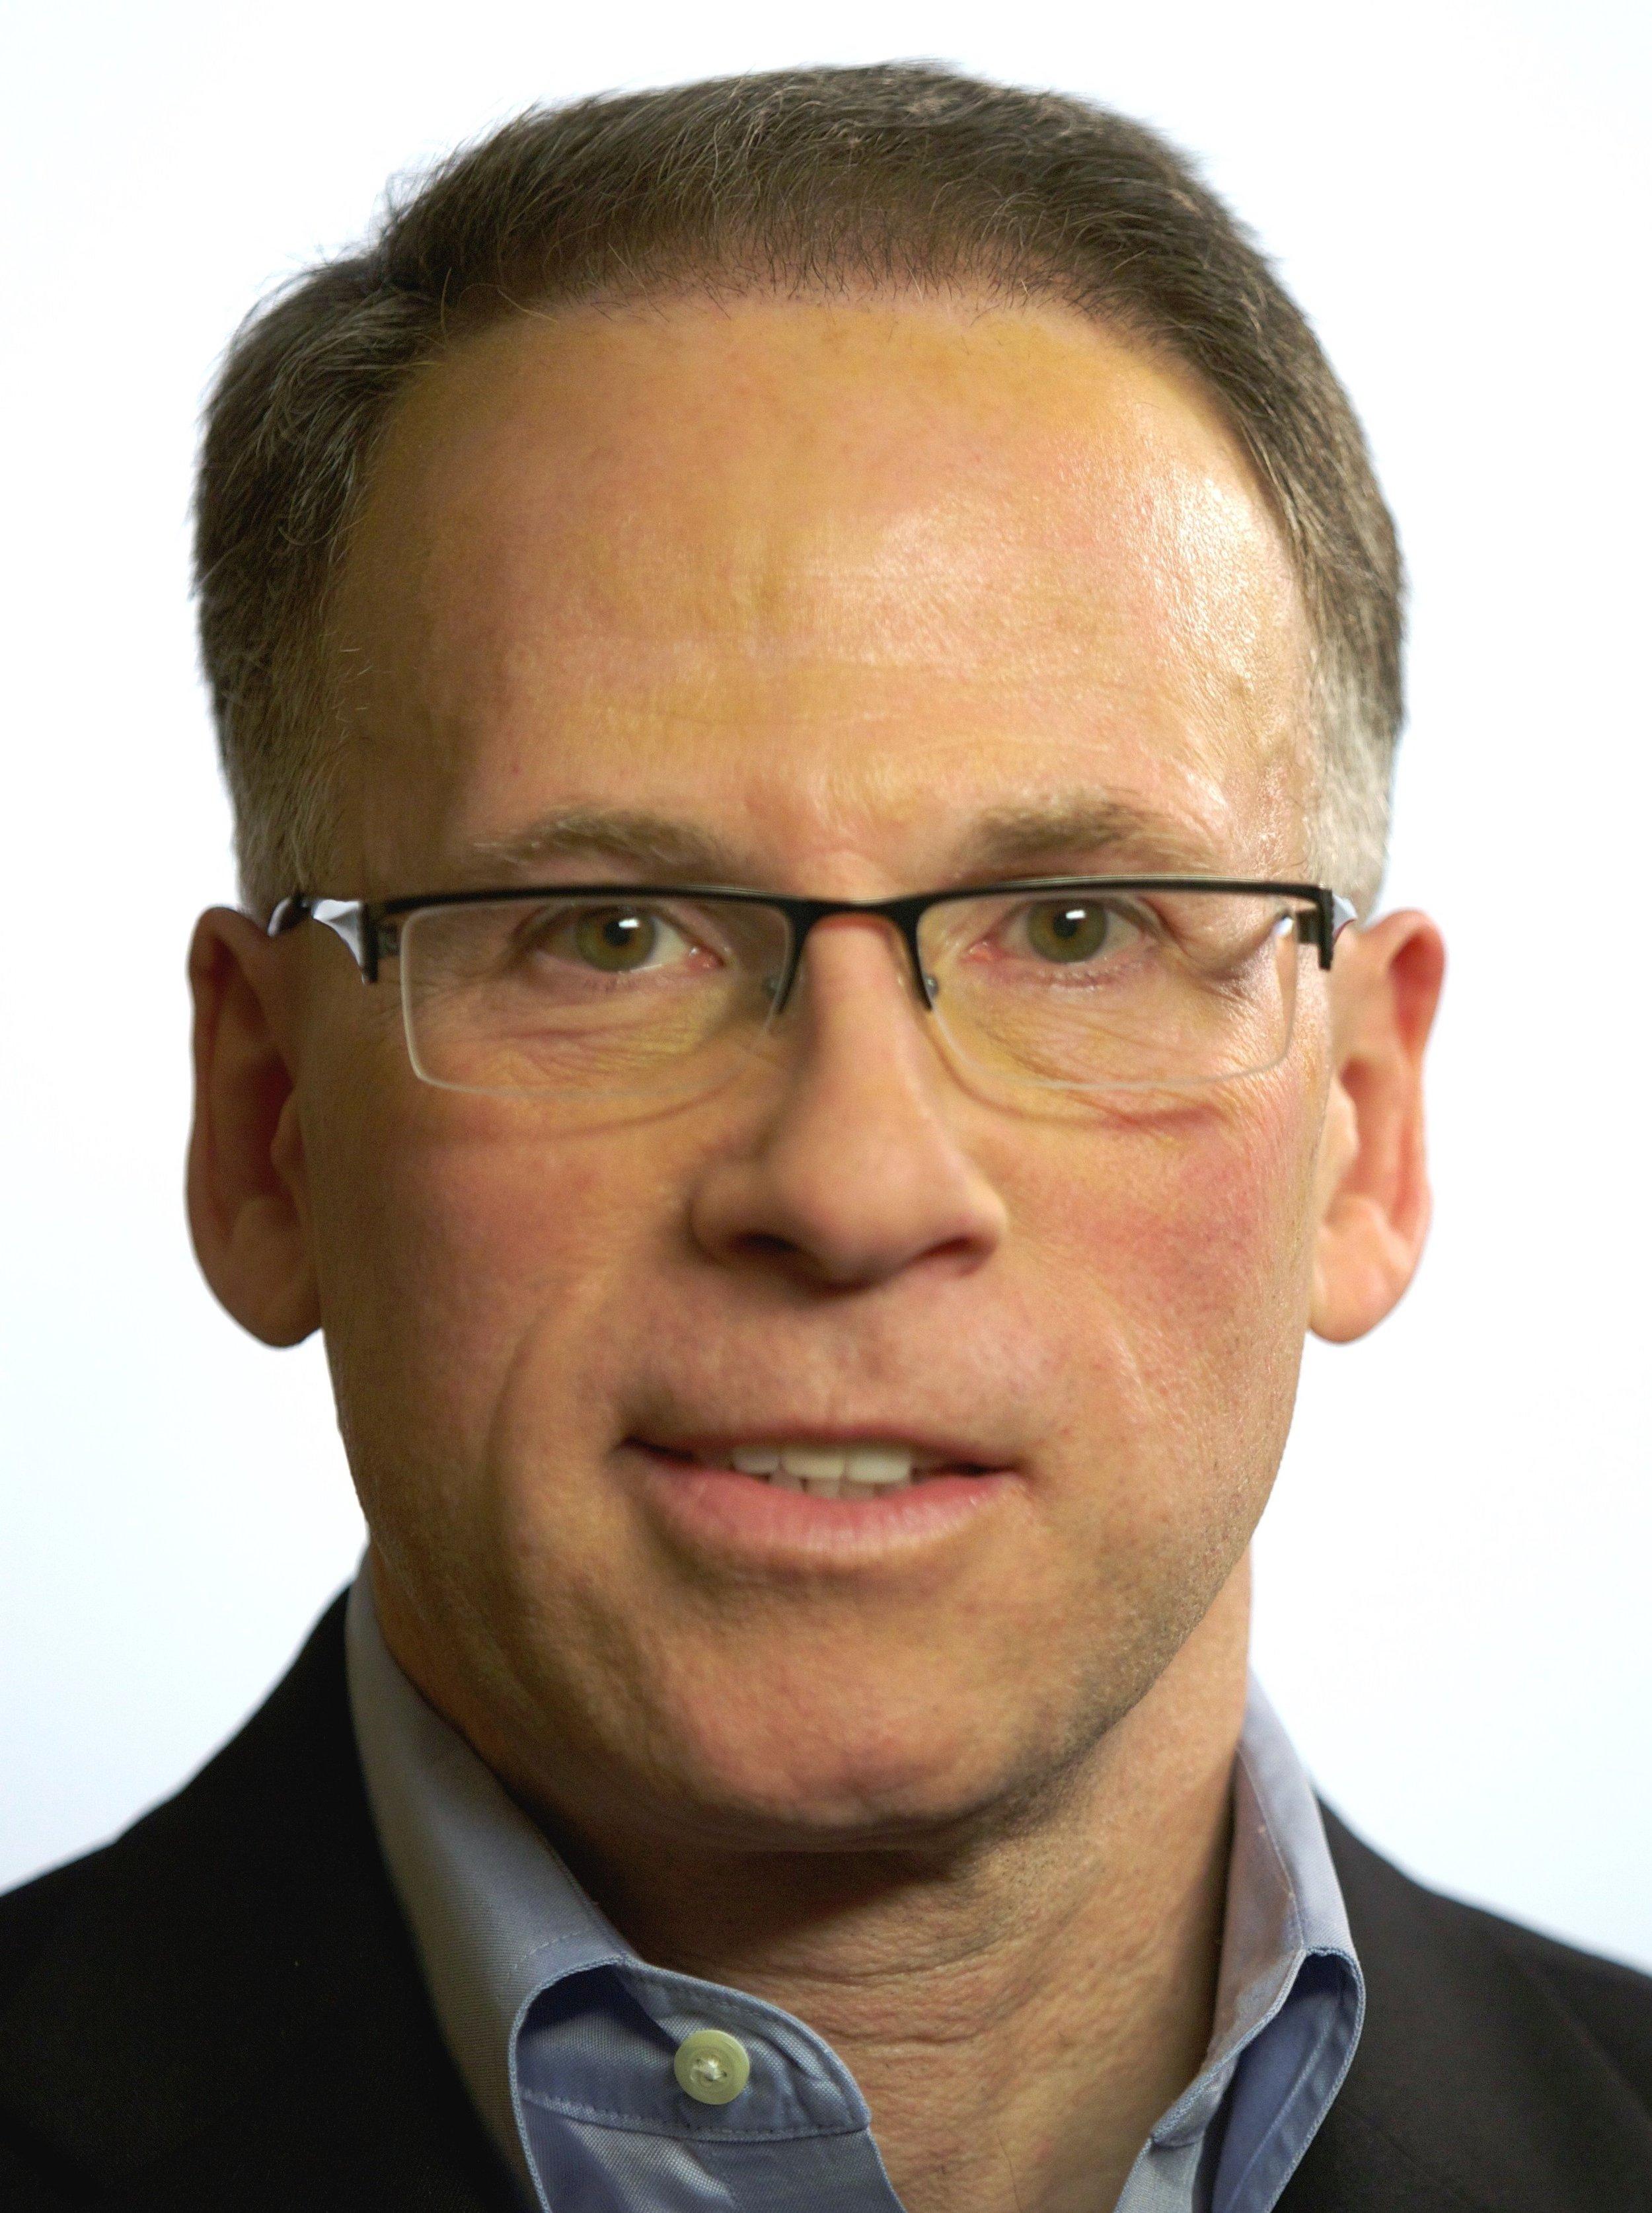 Adam Dakin Managing Director of Dreamit Health